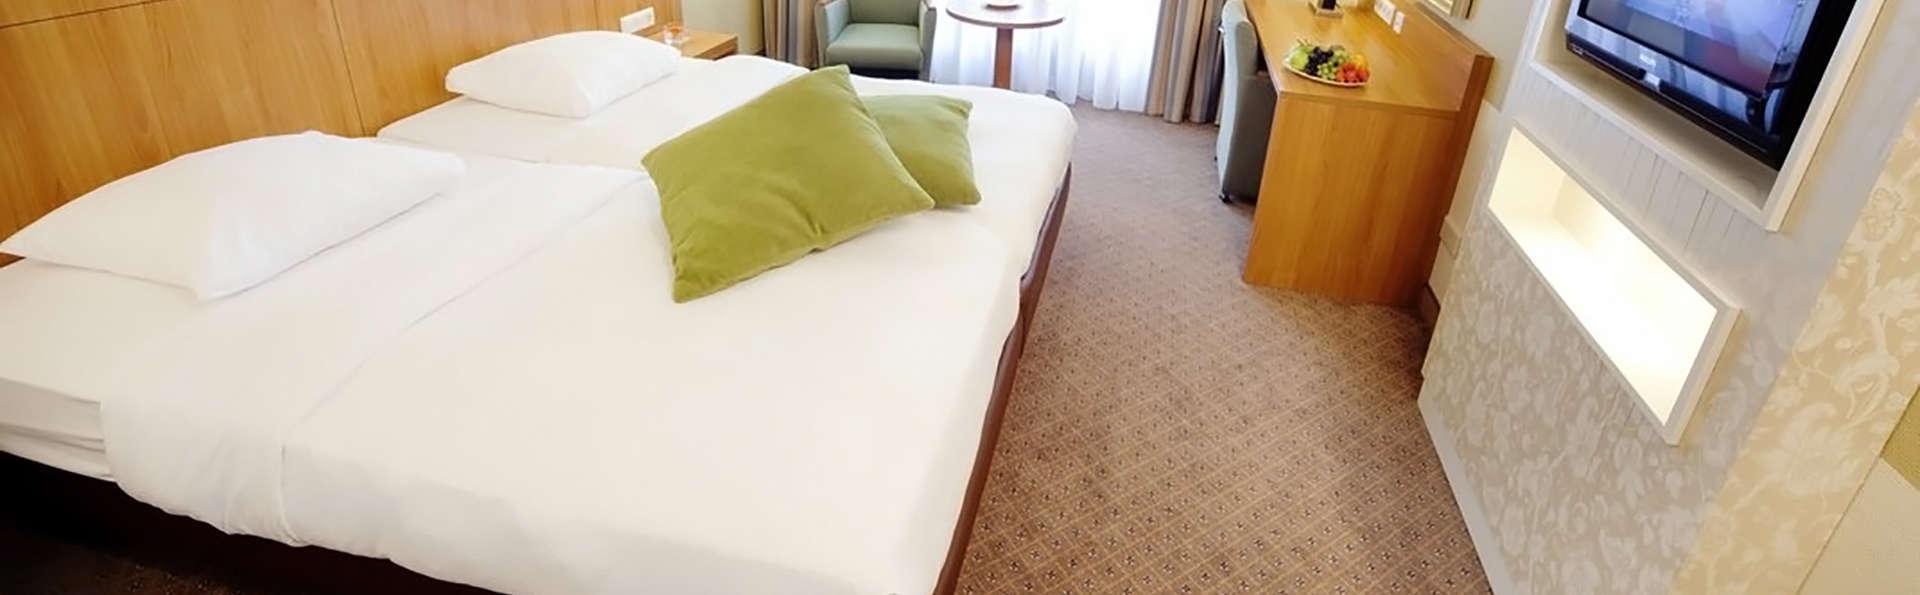 Bilderberg Hotel De Klepperman - EDIT_NEW_ROOM2.jpg